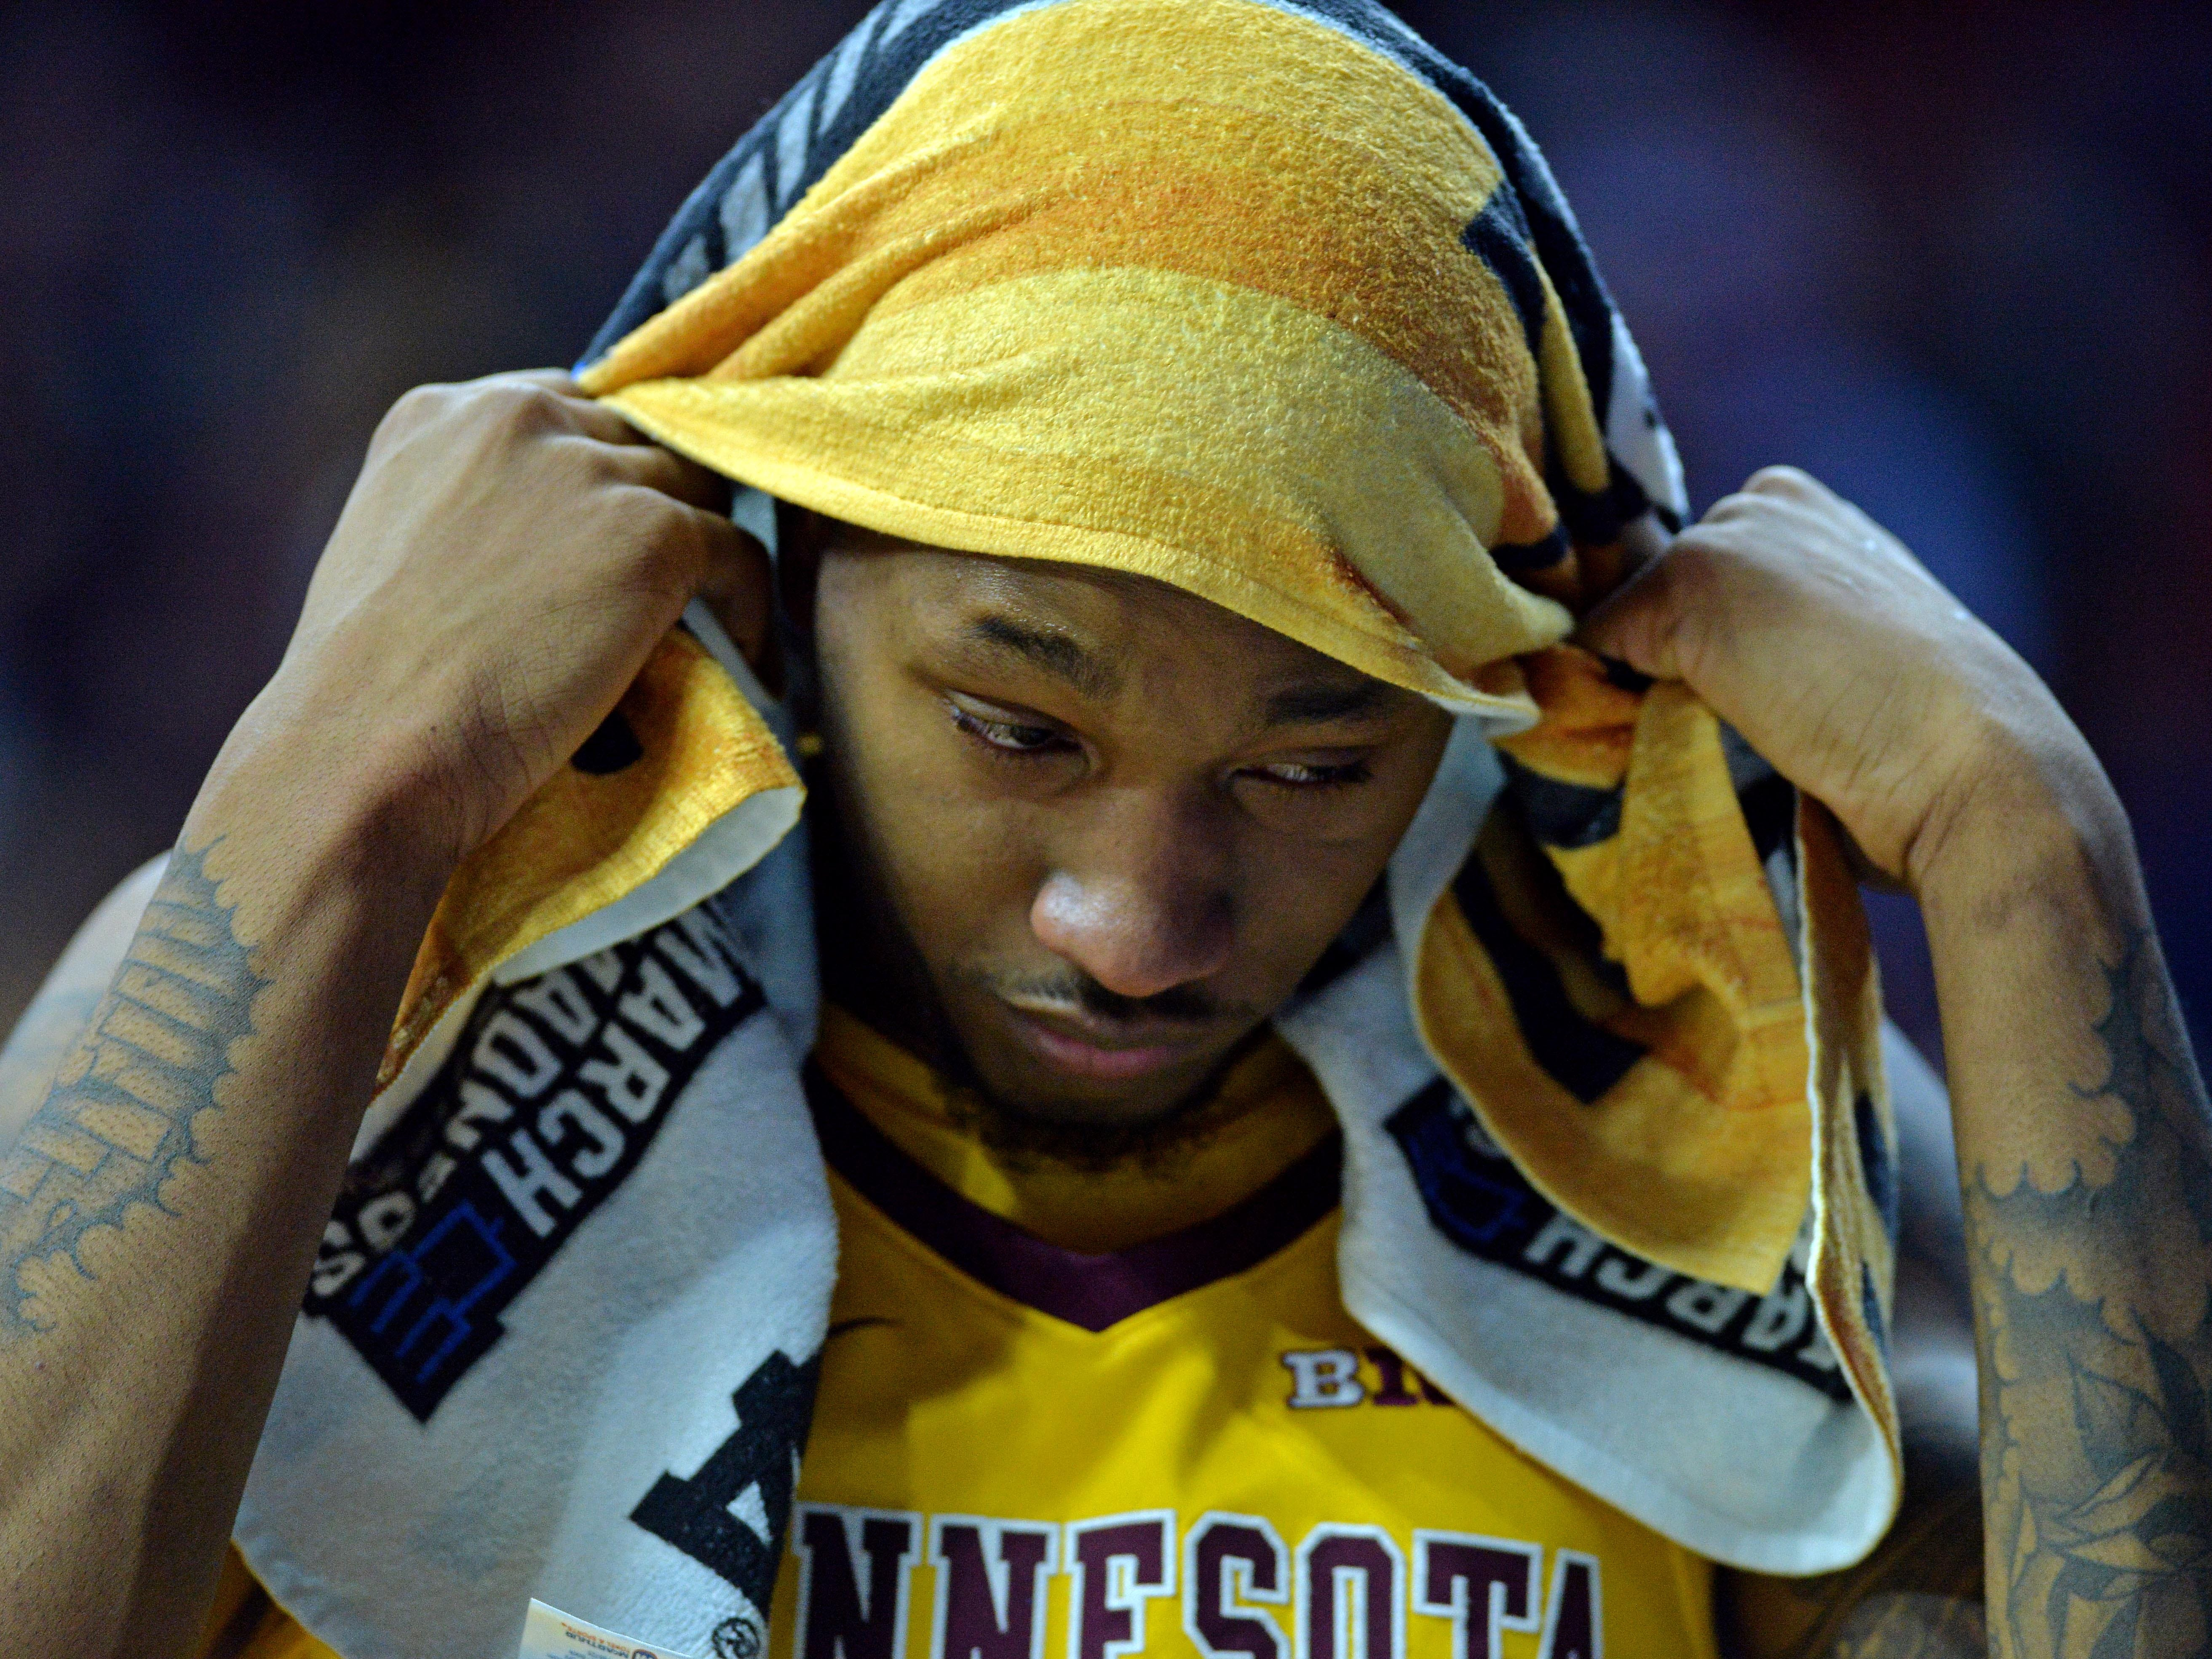 Round of 32: No. 10 Minnesota loses to No. 2 Michigan State, 70-50.